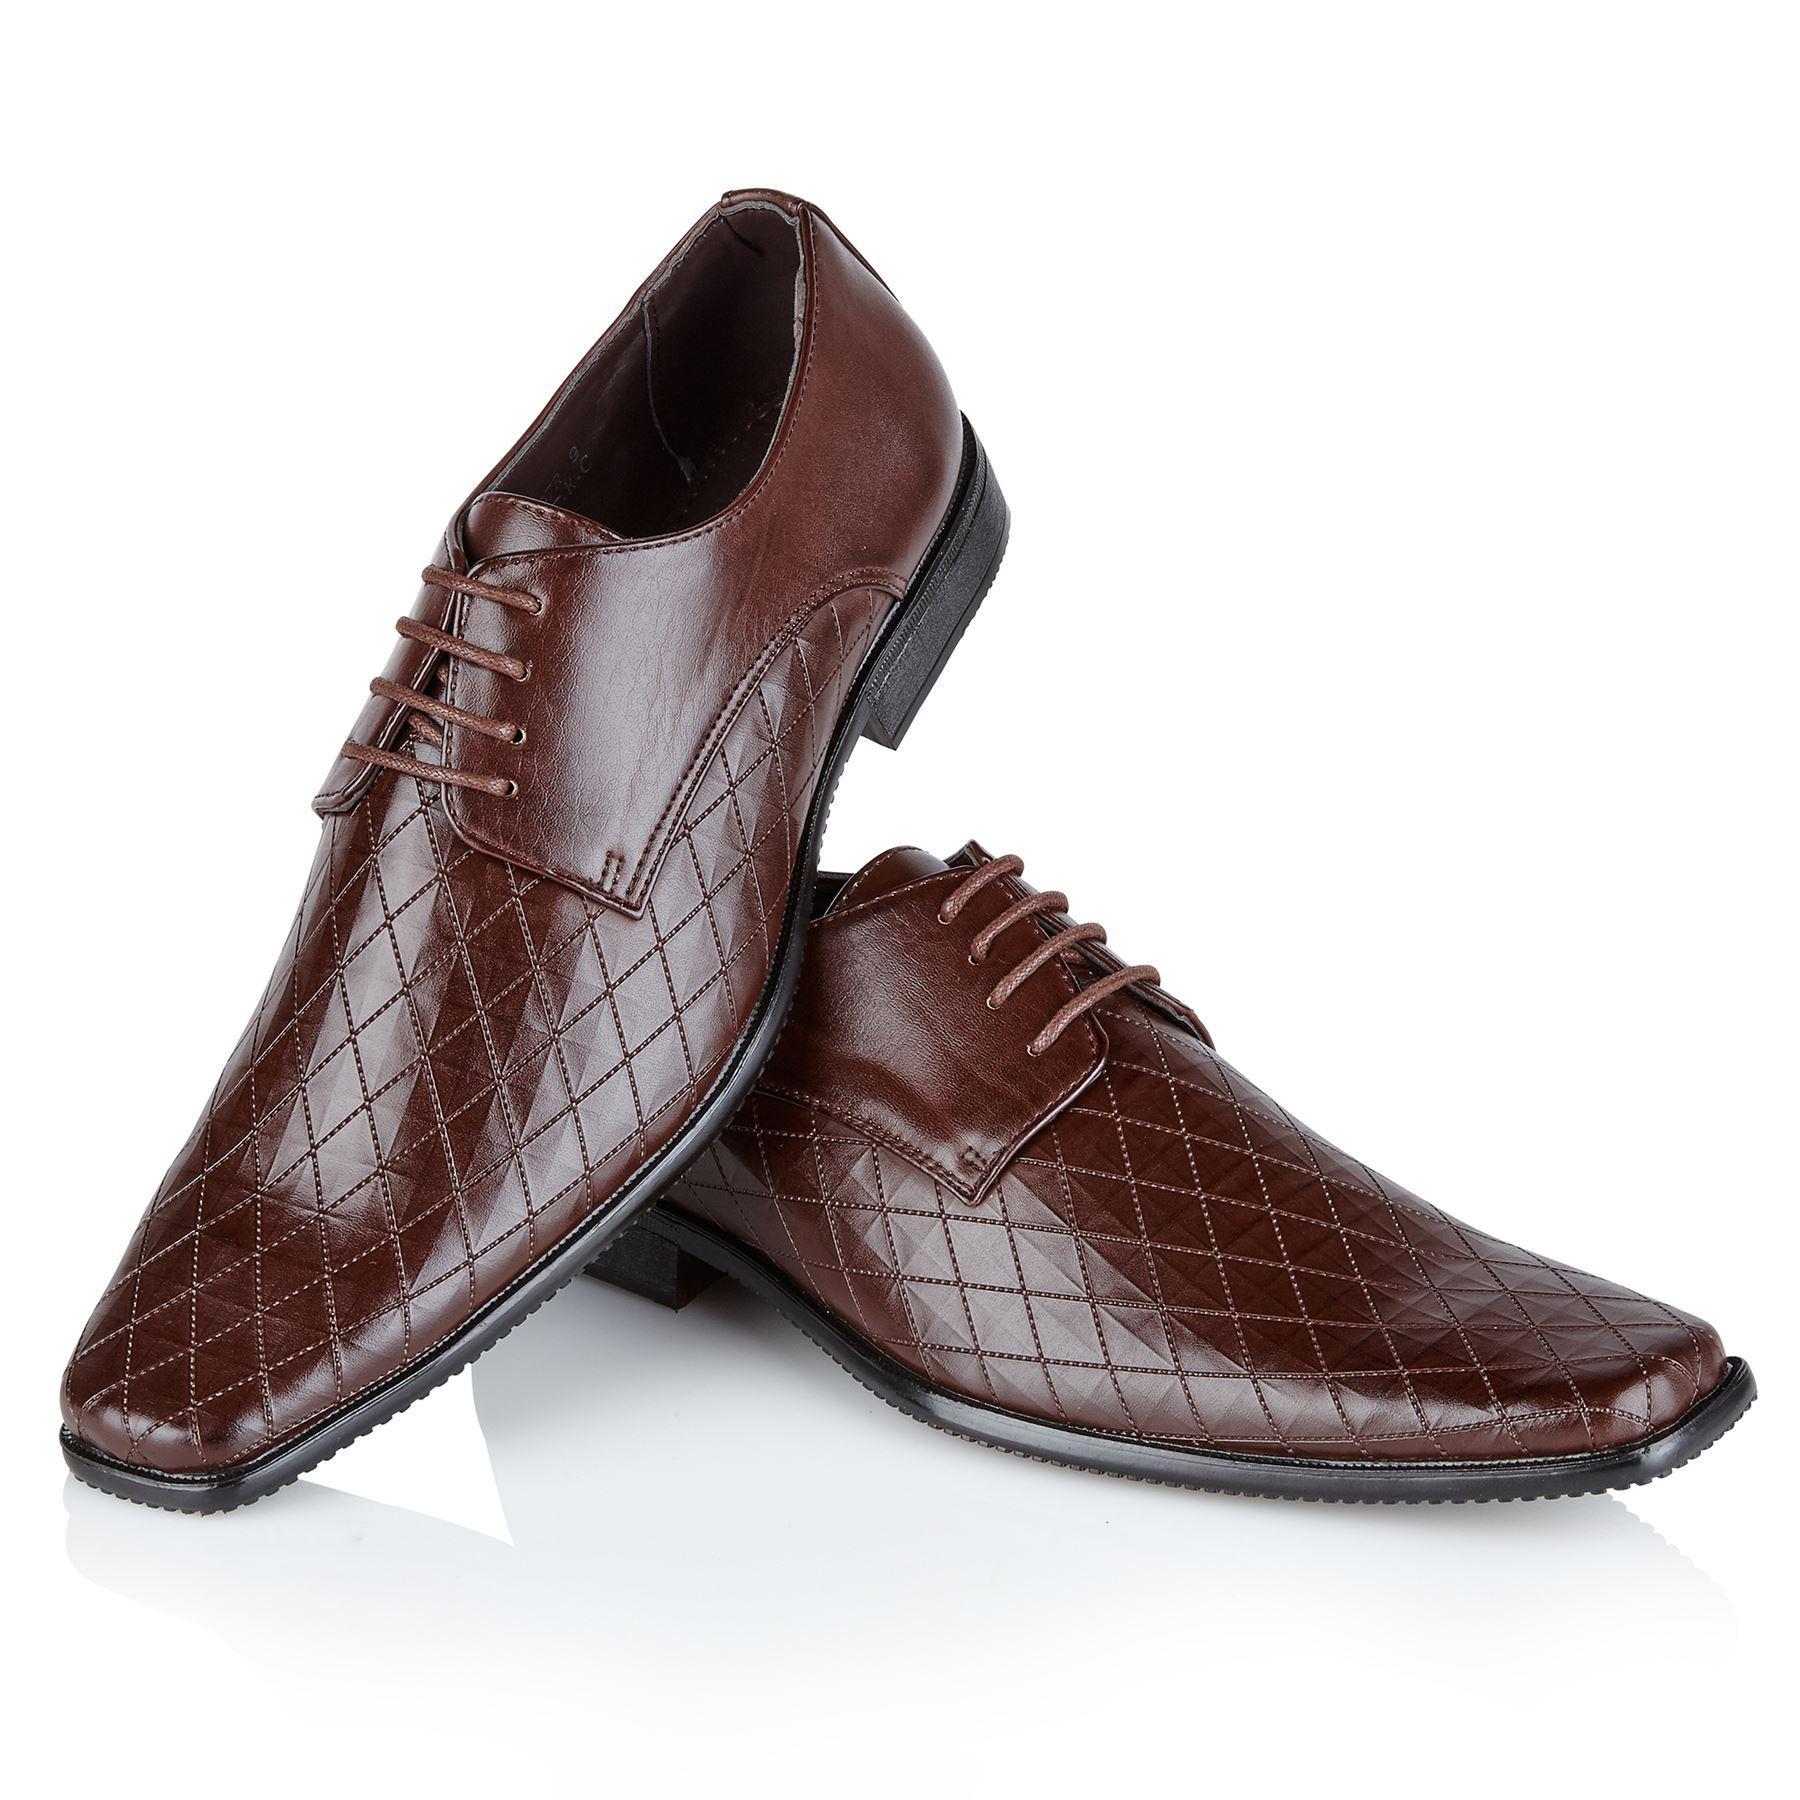 Casual Wedding Shoes 008 - Casual Wedding Shoes